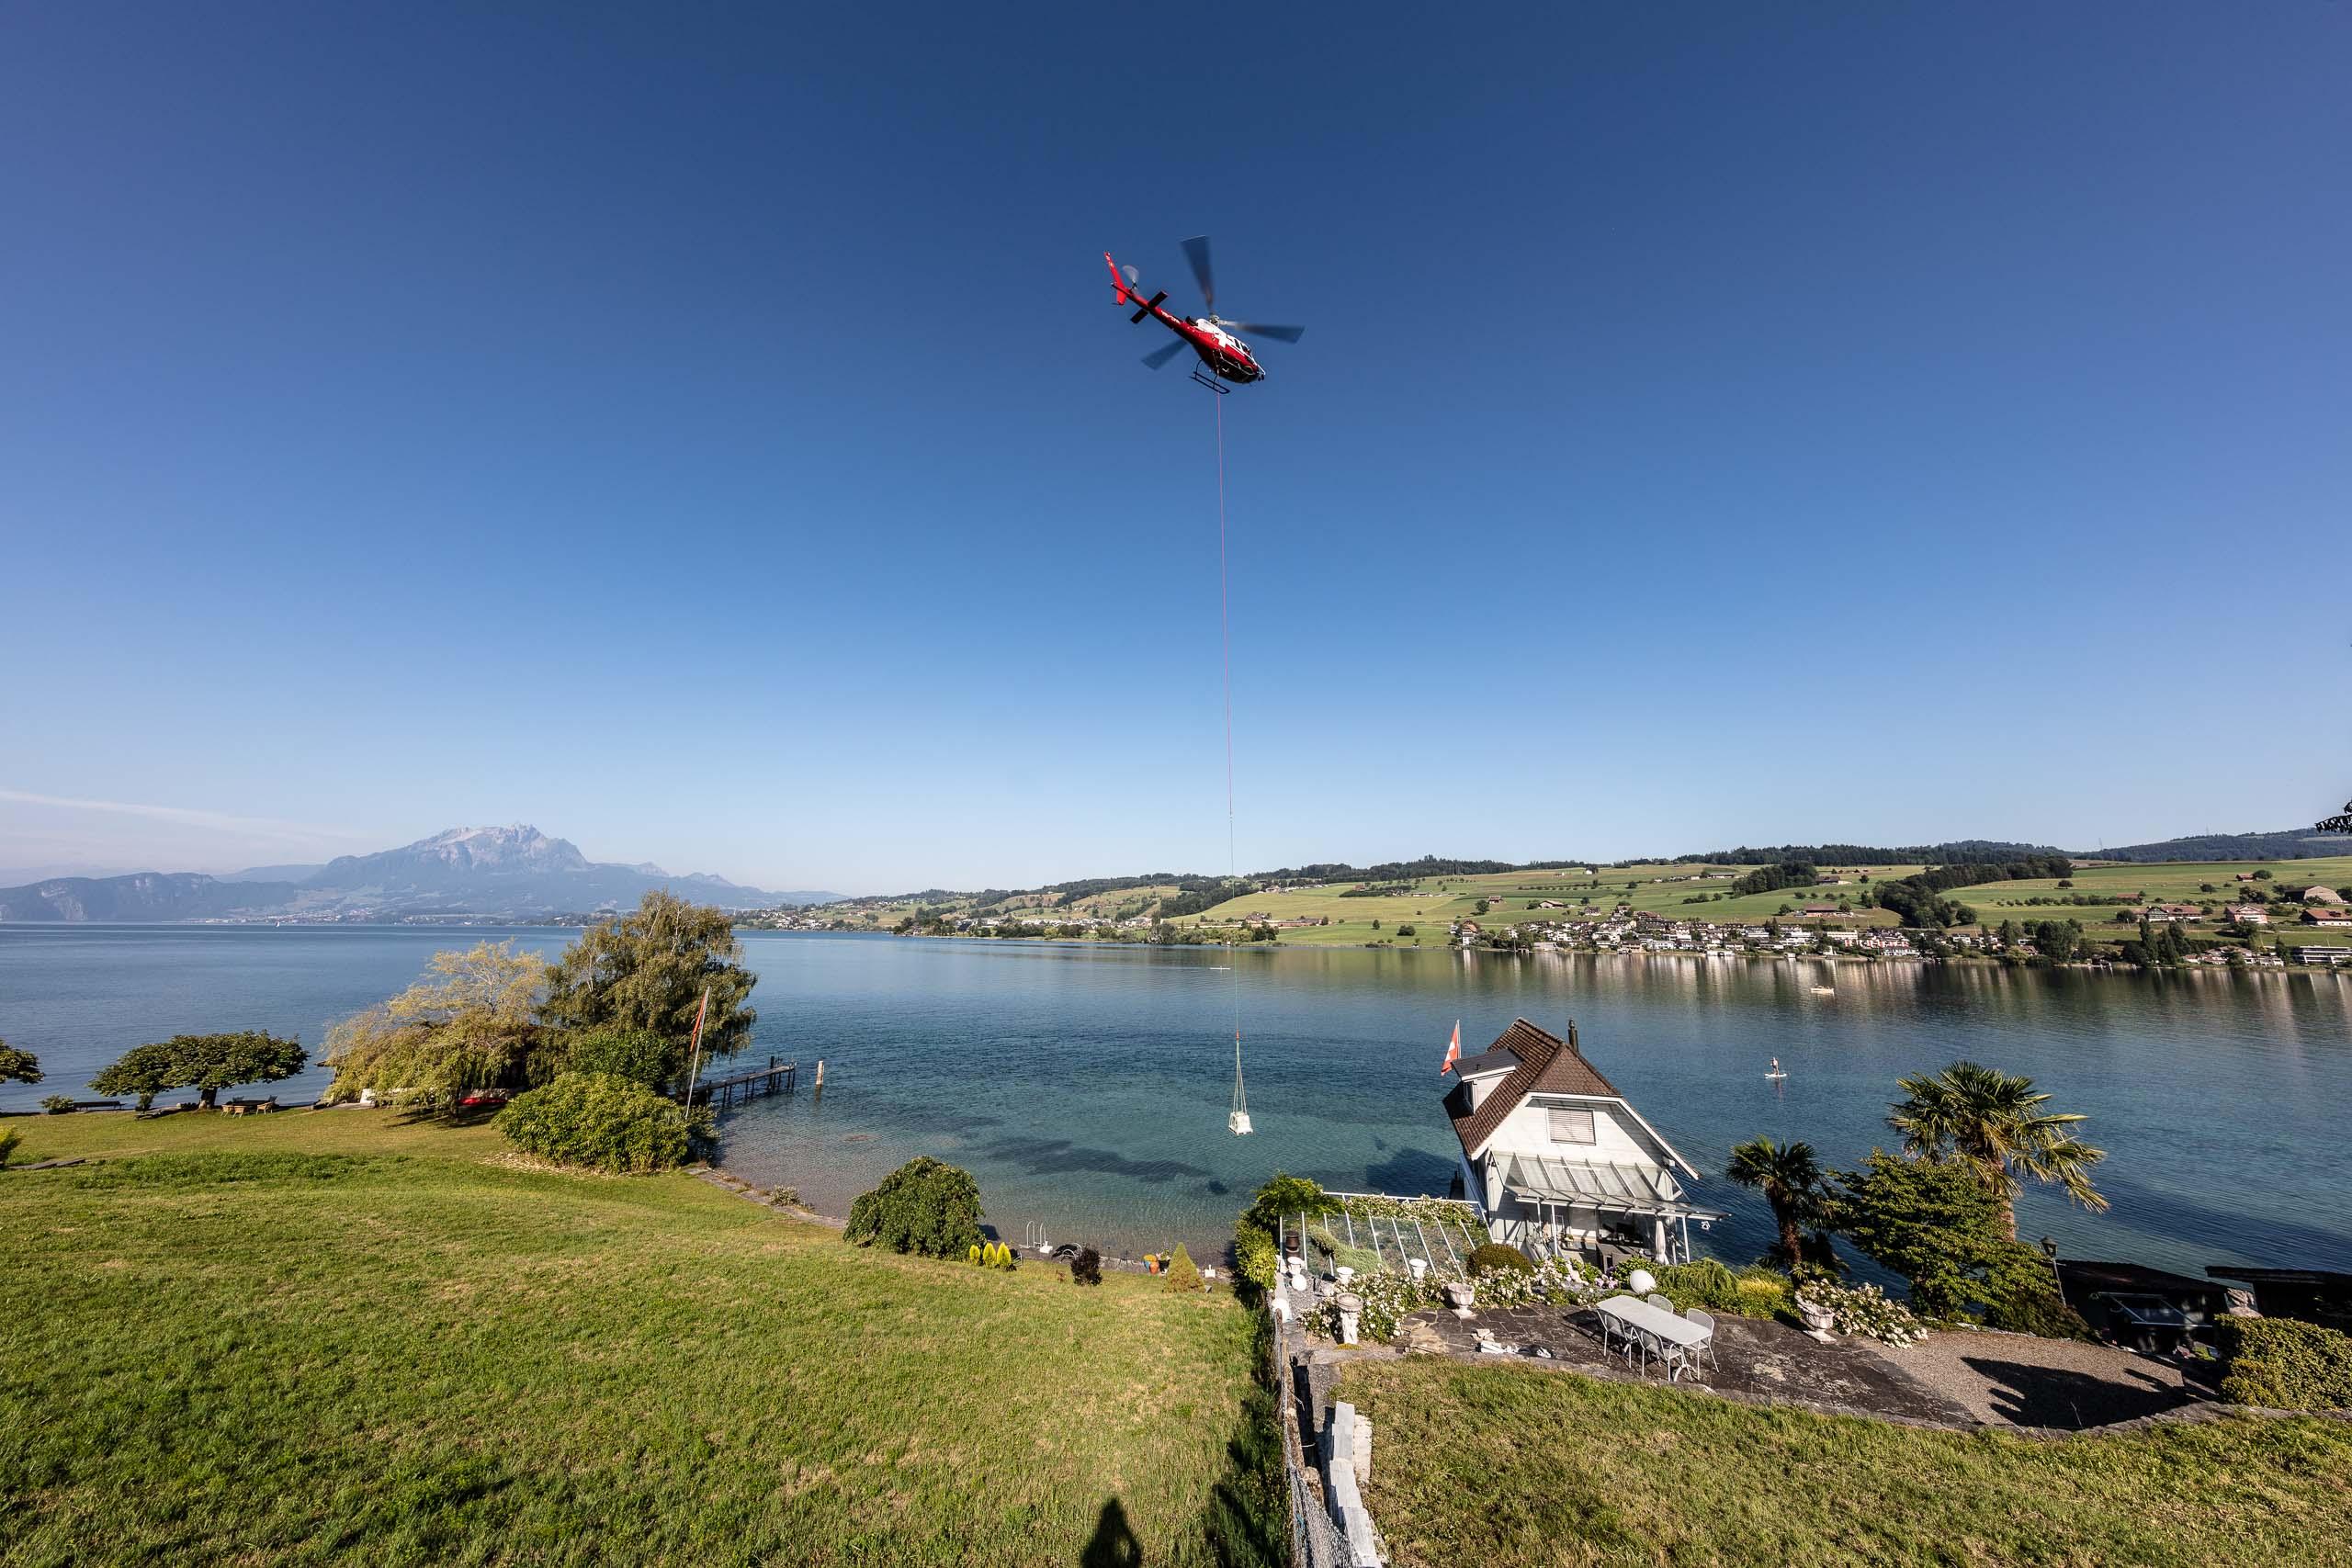 Helikopterflug_Transport_Schweiz_Badrutt